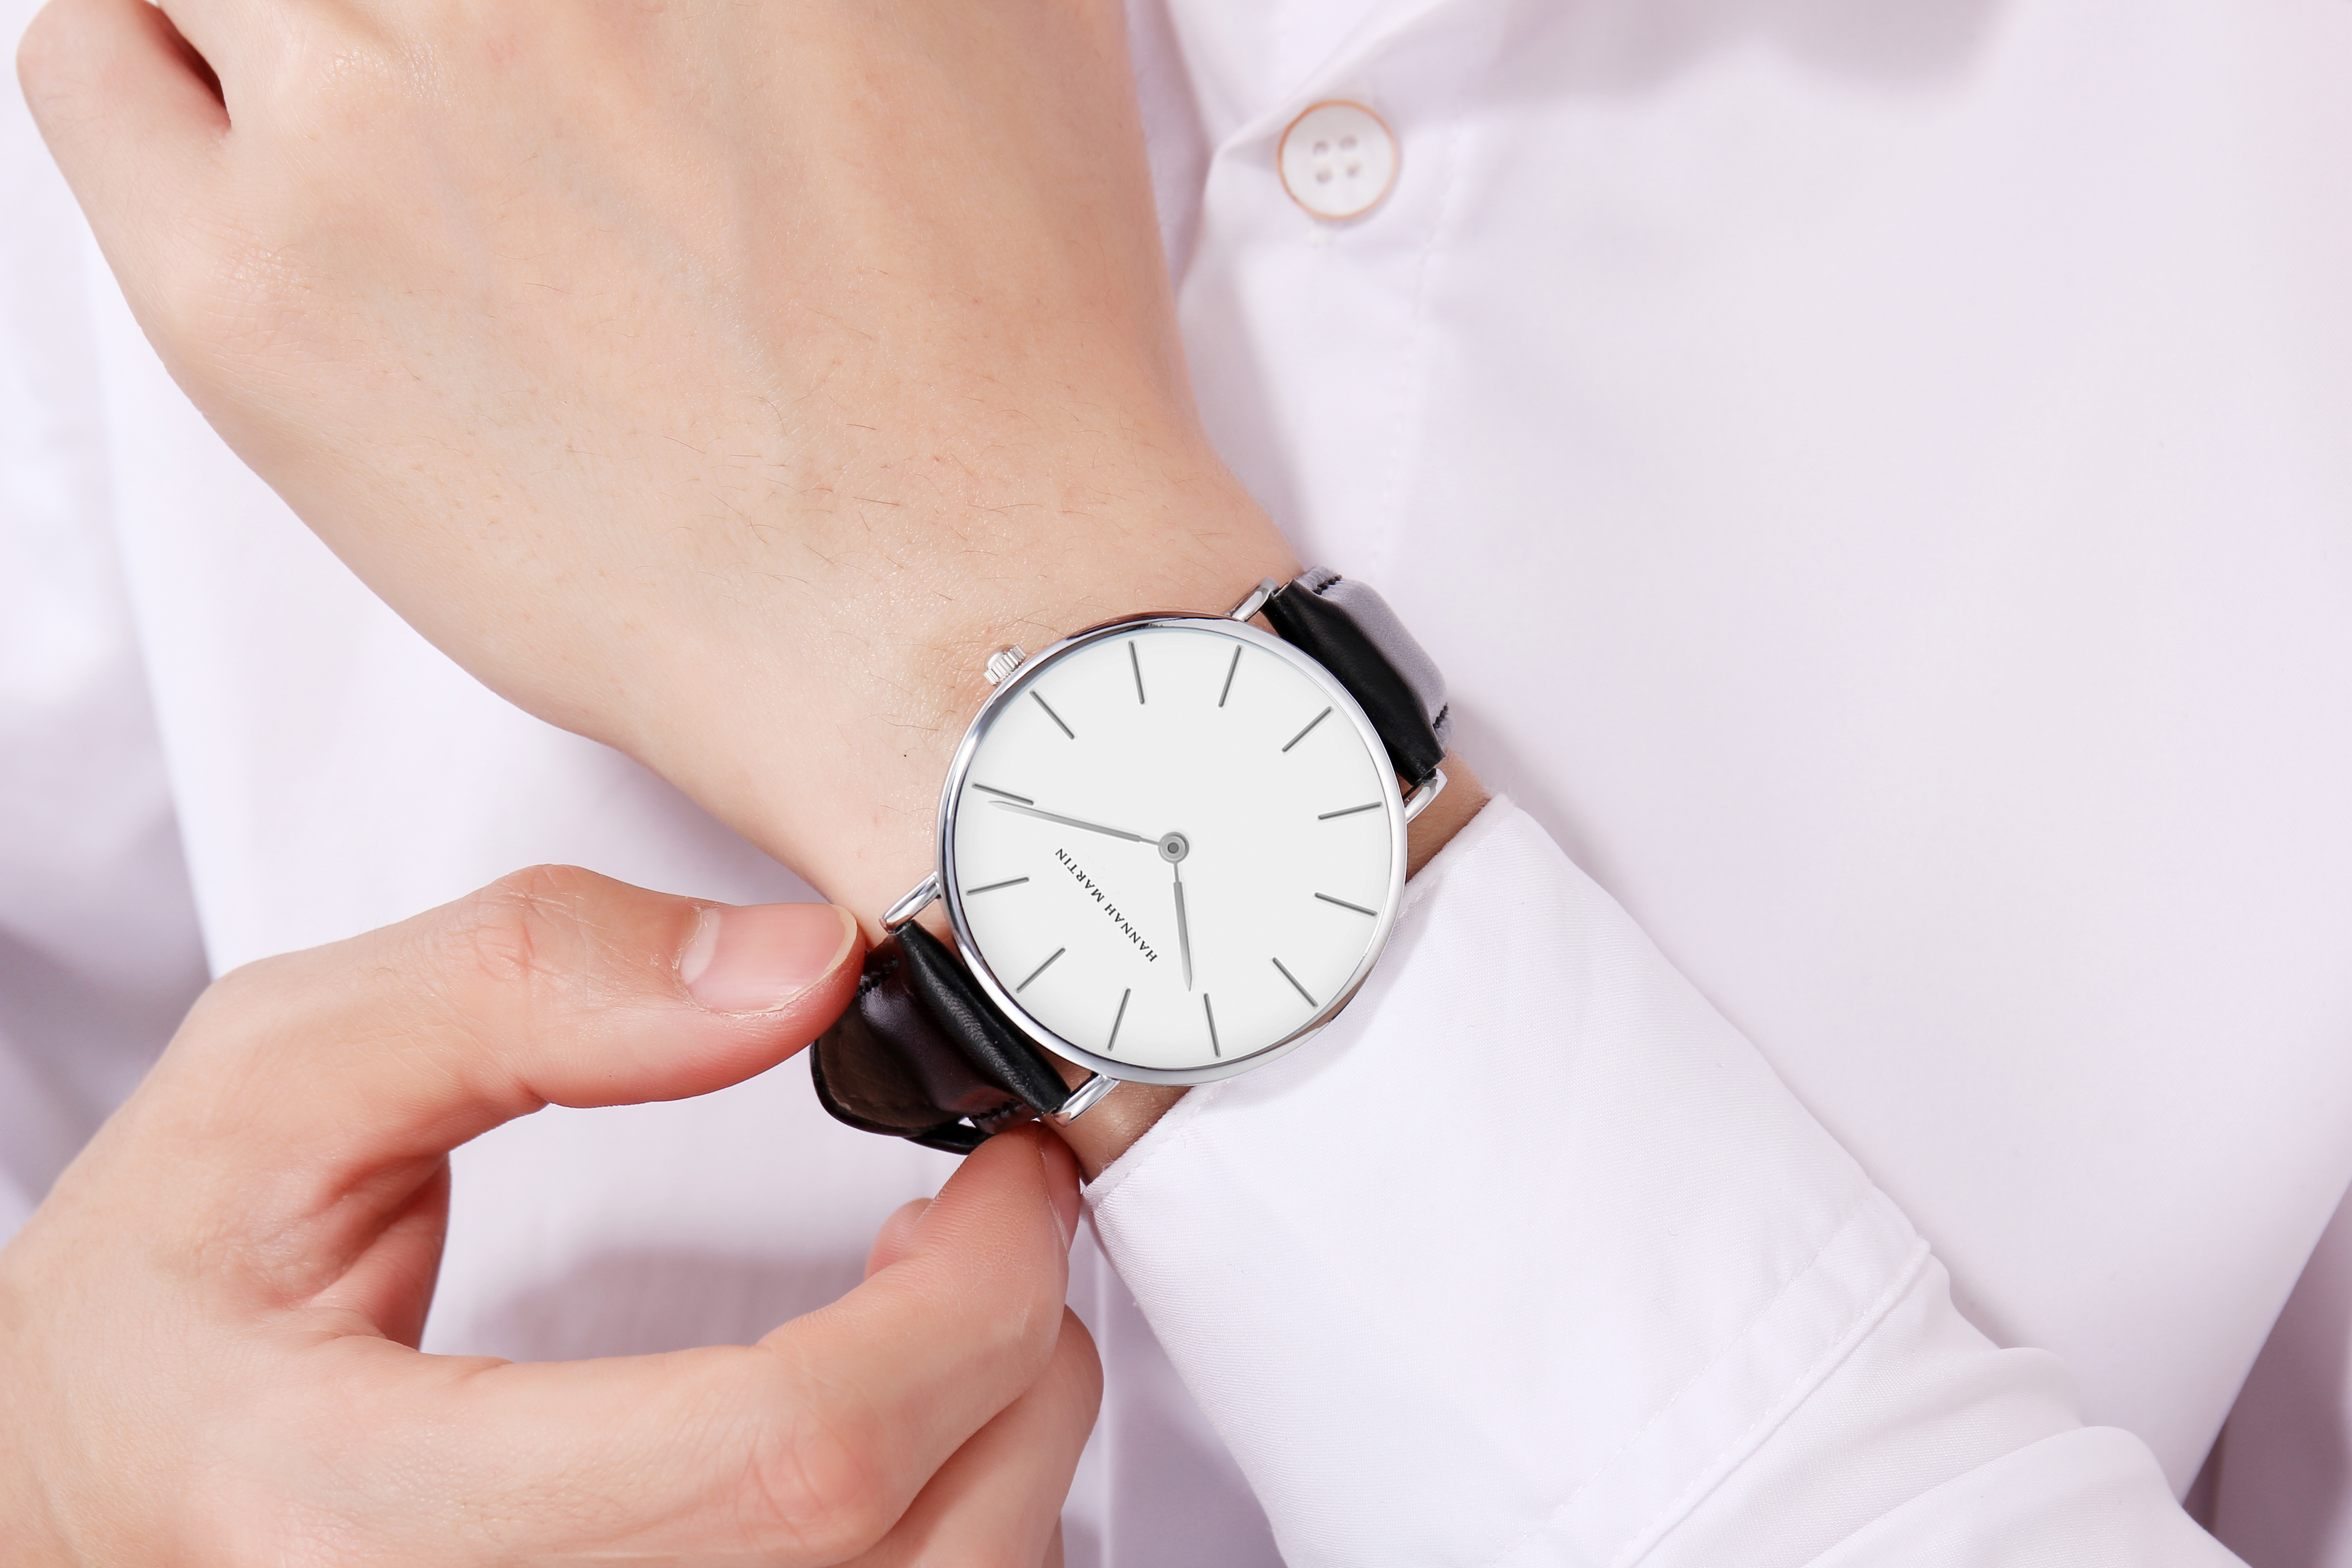 HTB1qjsyalsmBKNjSZFFq6AT9VXag Dropshipping High Quality Rose Gold Dial Watch Men Leather Waterproof Wristwatch Women Dress Fashion Japan Quartz Movement Saat